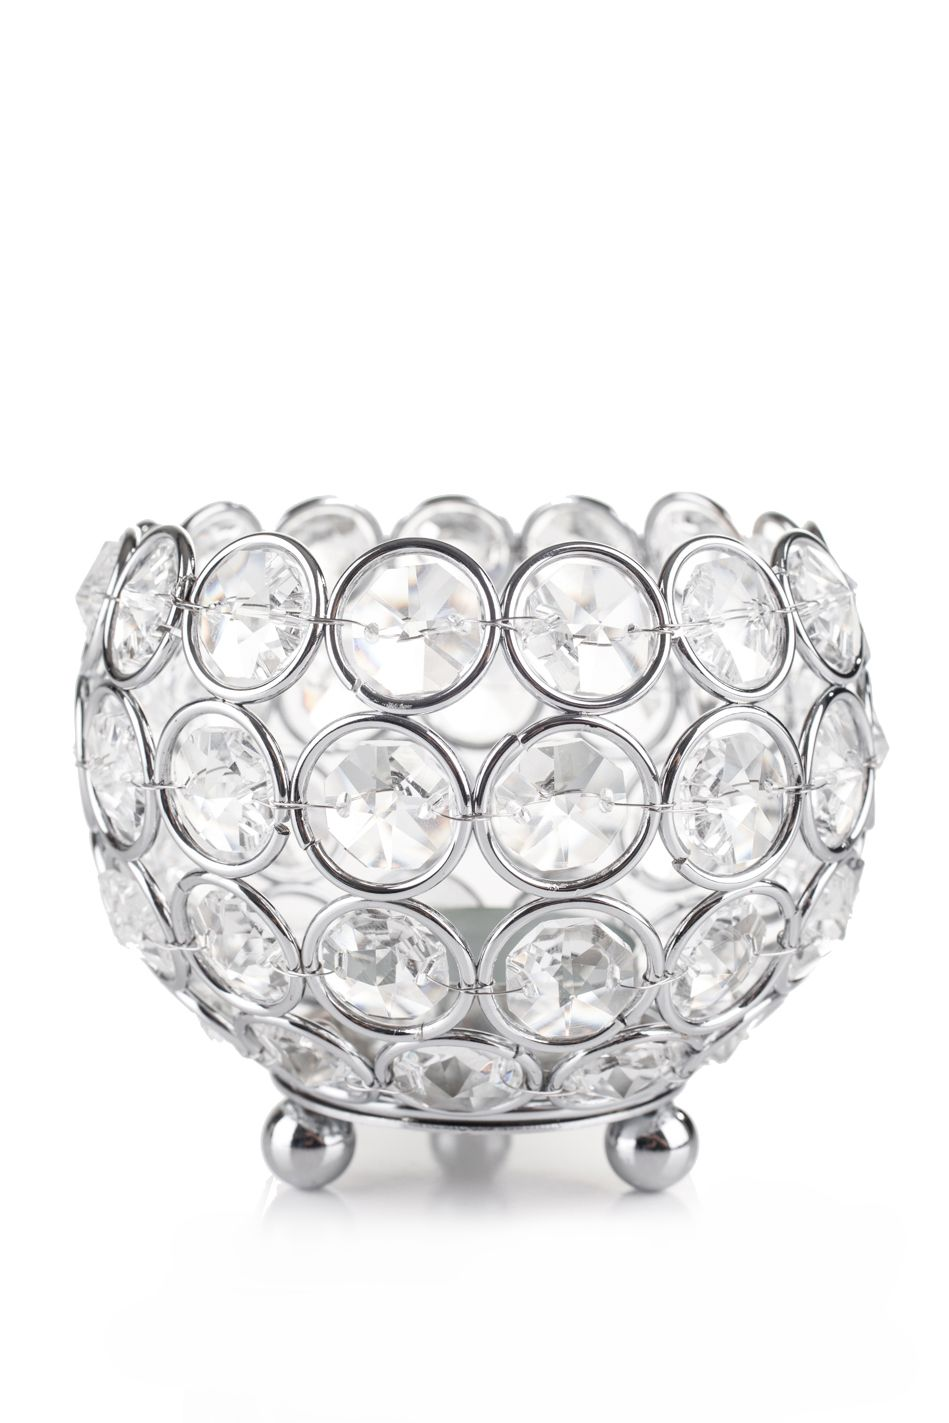 Candle Holder Round Real Beaded Crystal Votive Prestige 4